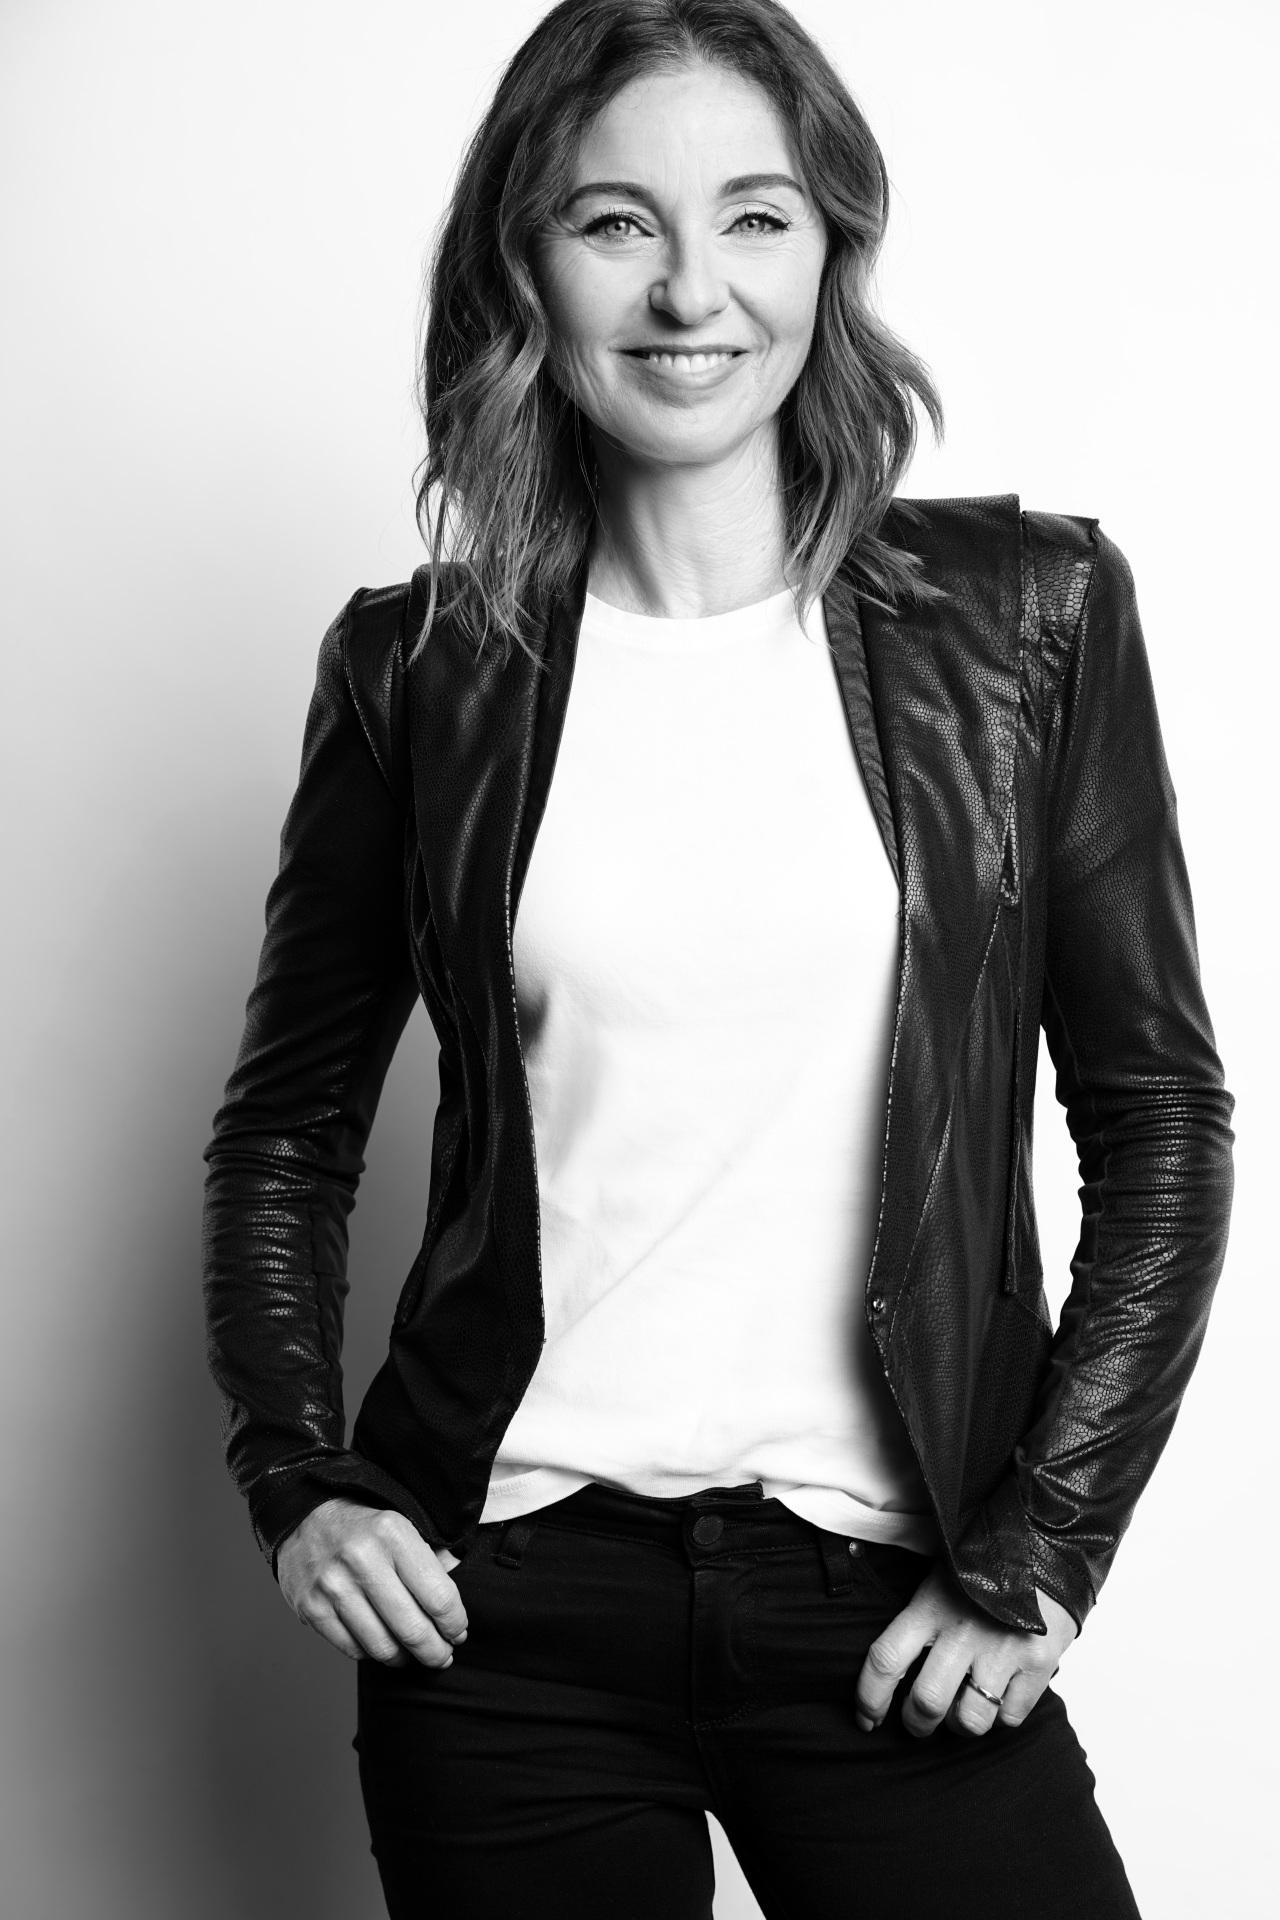 Seattle Nail Designer|Cassidy Martin